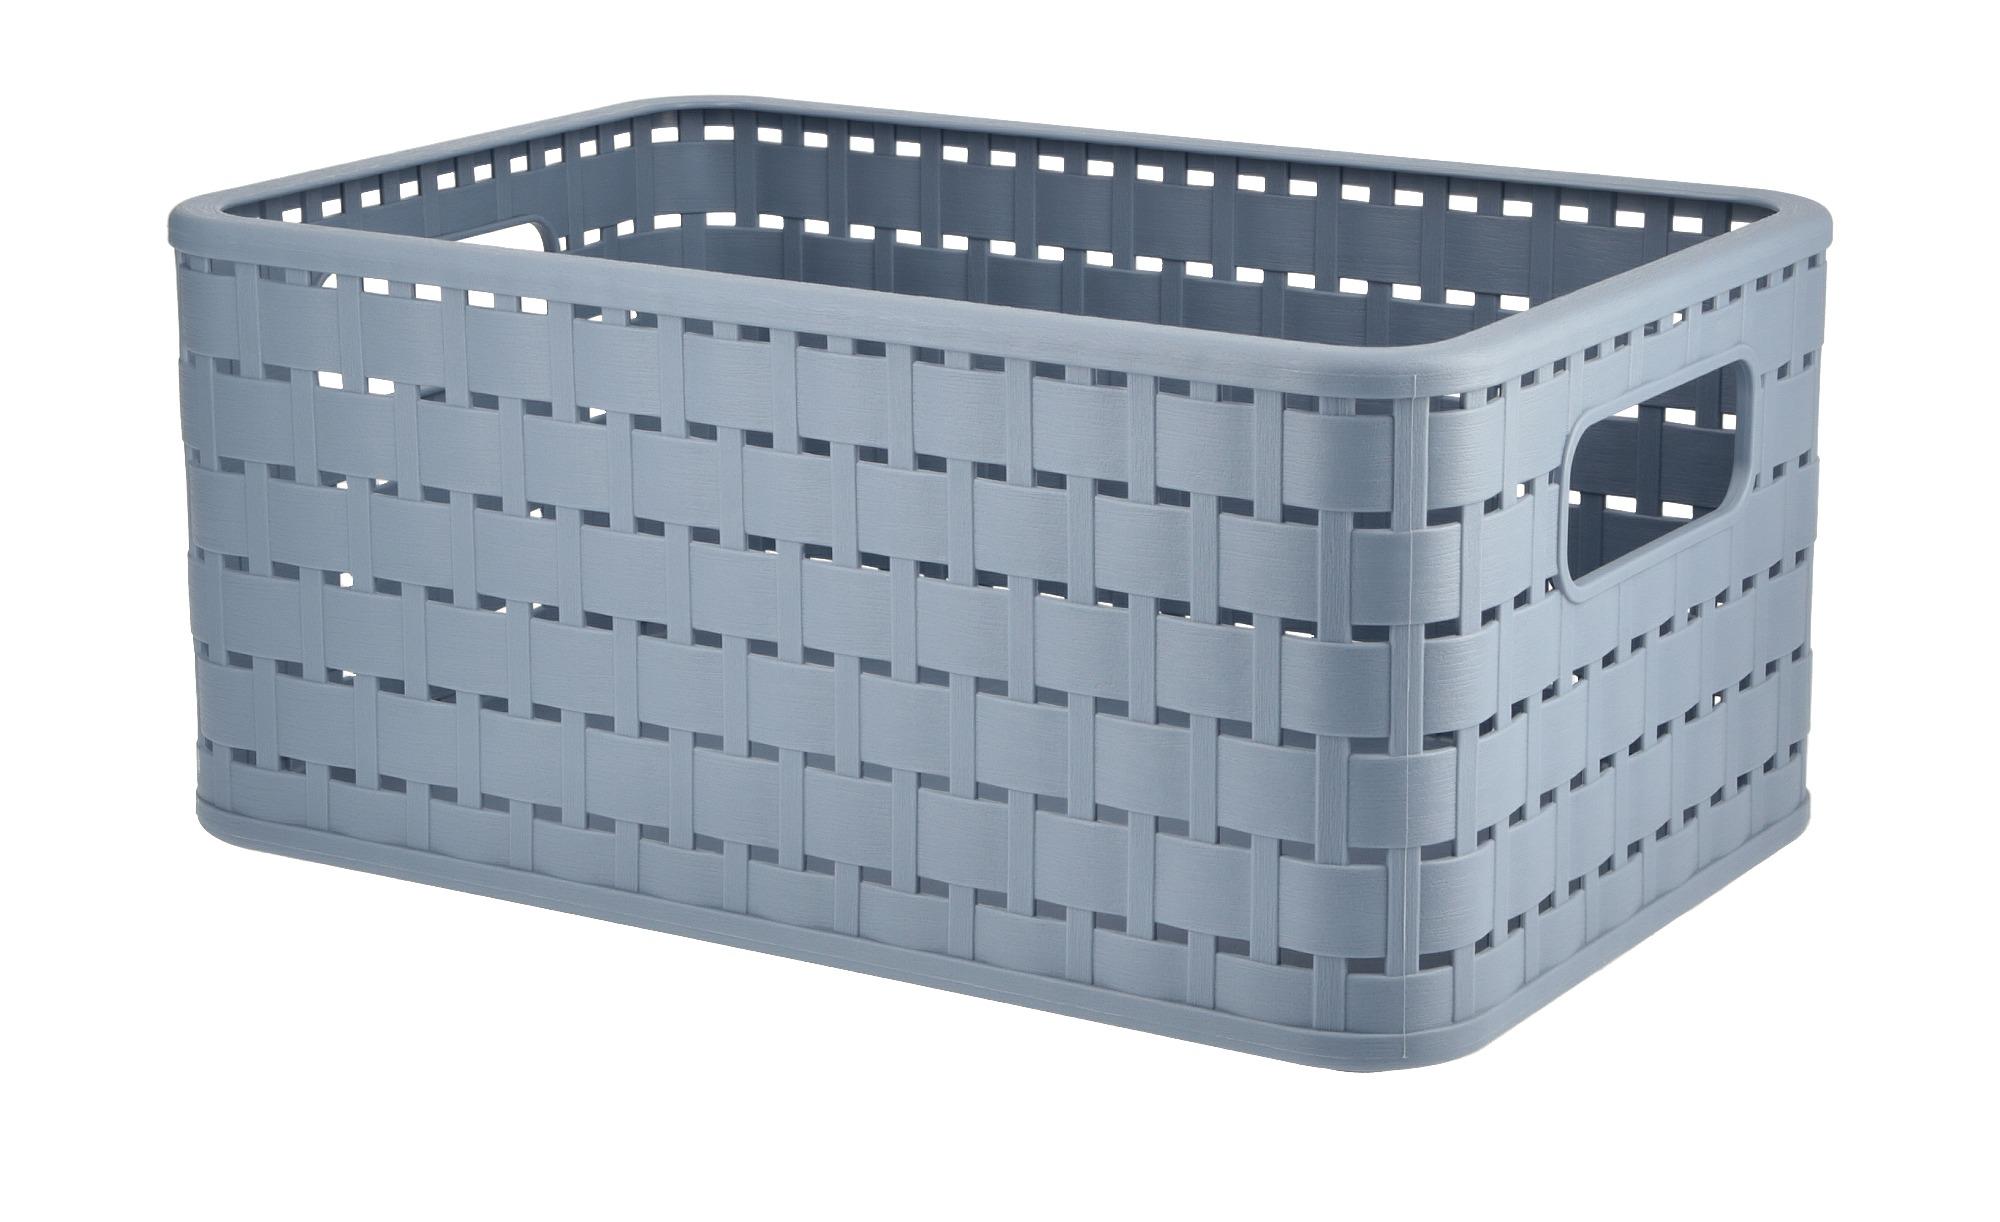 Rotho Aufbewahrungsbox ¦ blau ¦ Kunststoff Aufbewahrung > Aufbewahrungsboxen > sonstige Aufbewahrungsmittel - Höffner